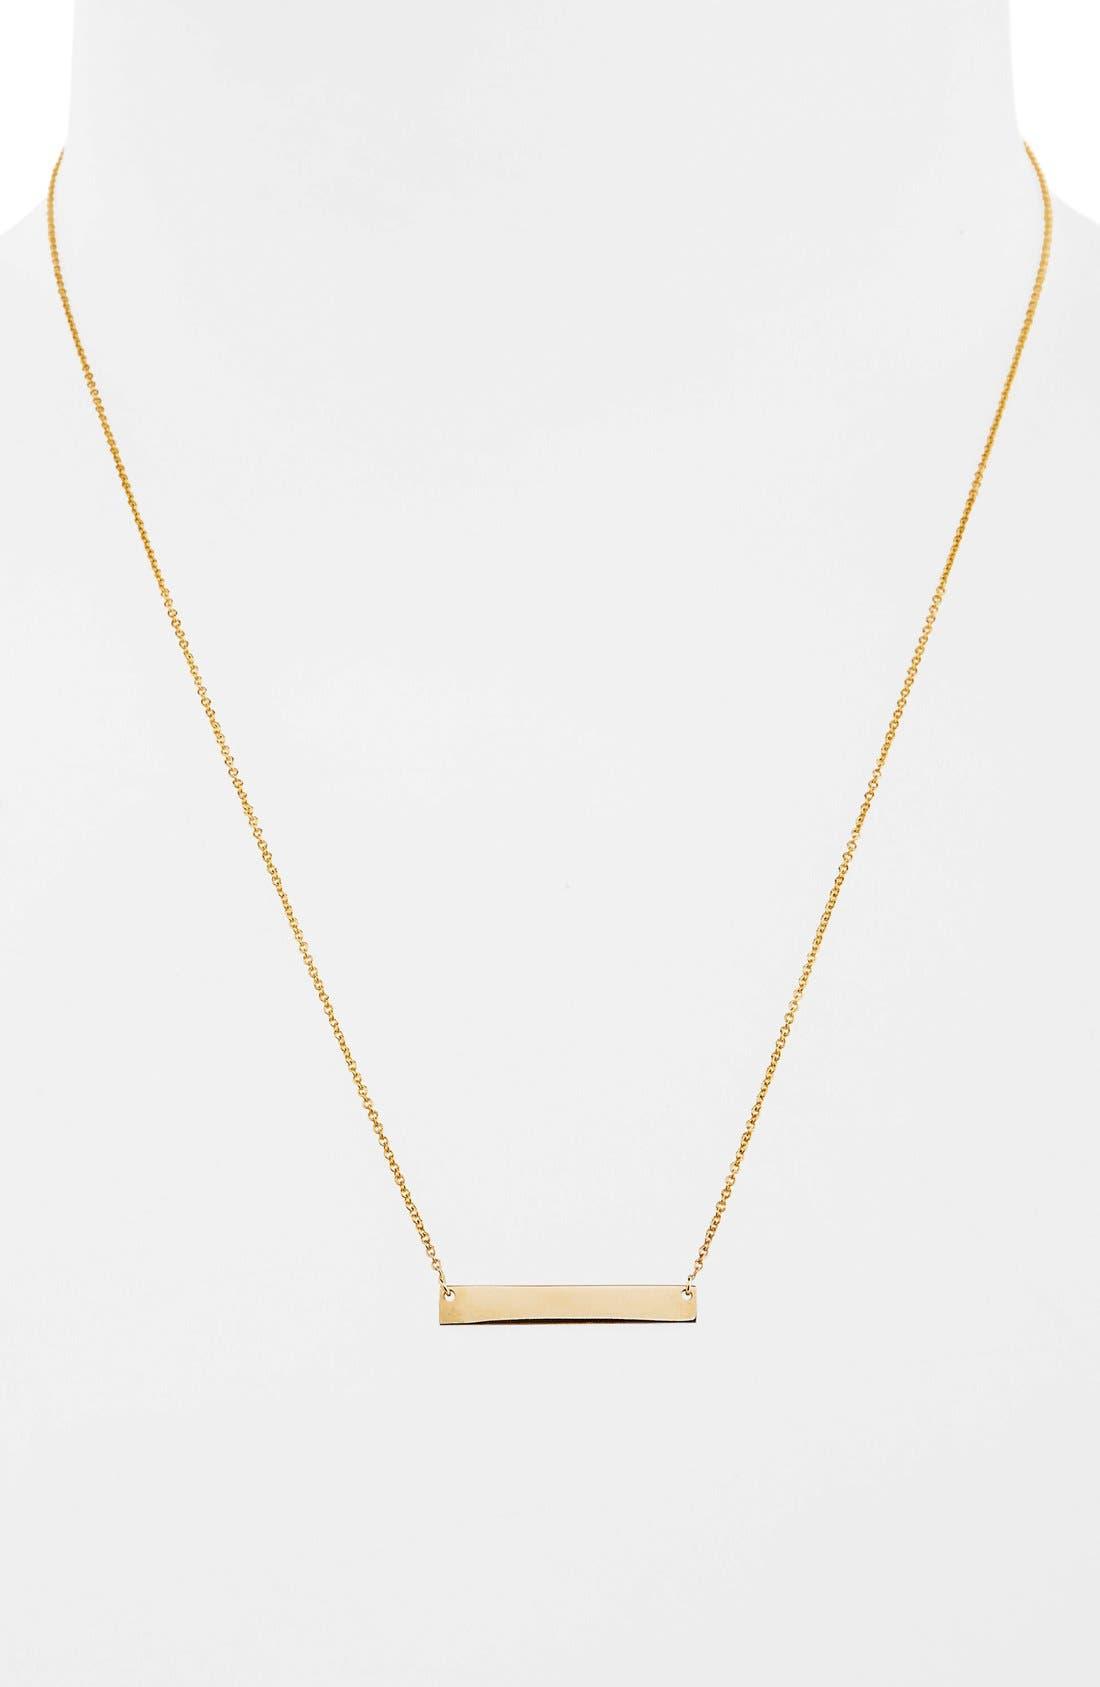 14k GoldBar Pendant Necklace,                             Alternate thumbnail 2, color,                             YELLOW GOLD